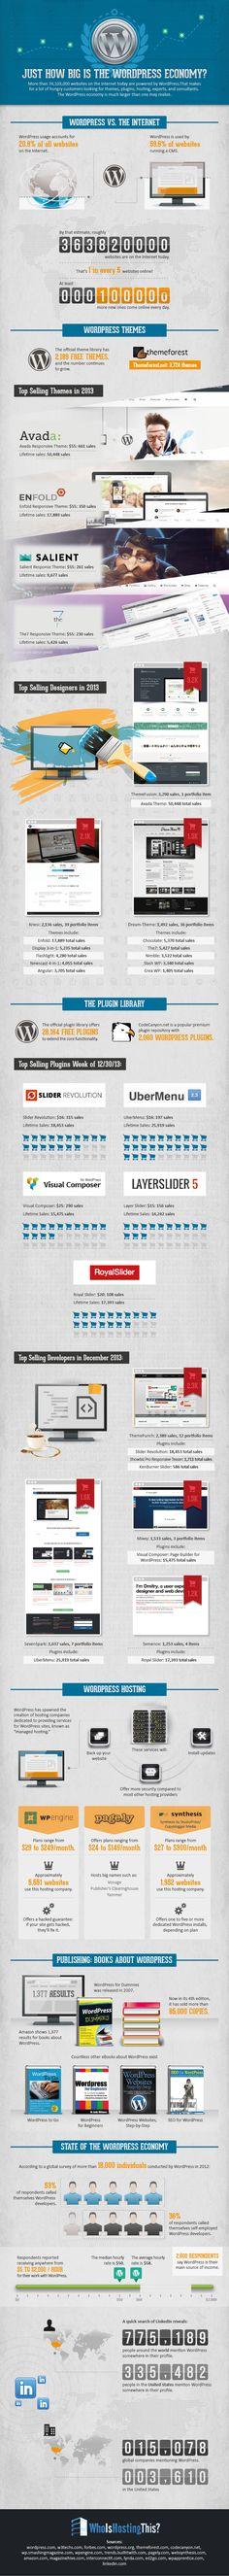 Just How Big is the WordPress Economy?   #infographic #WordPress #Blogging #MDMC400